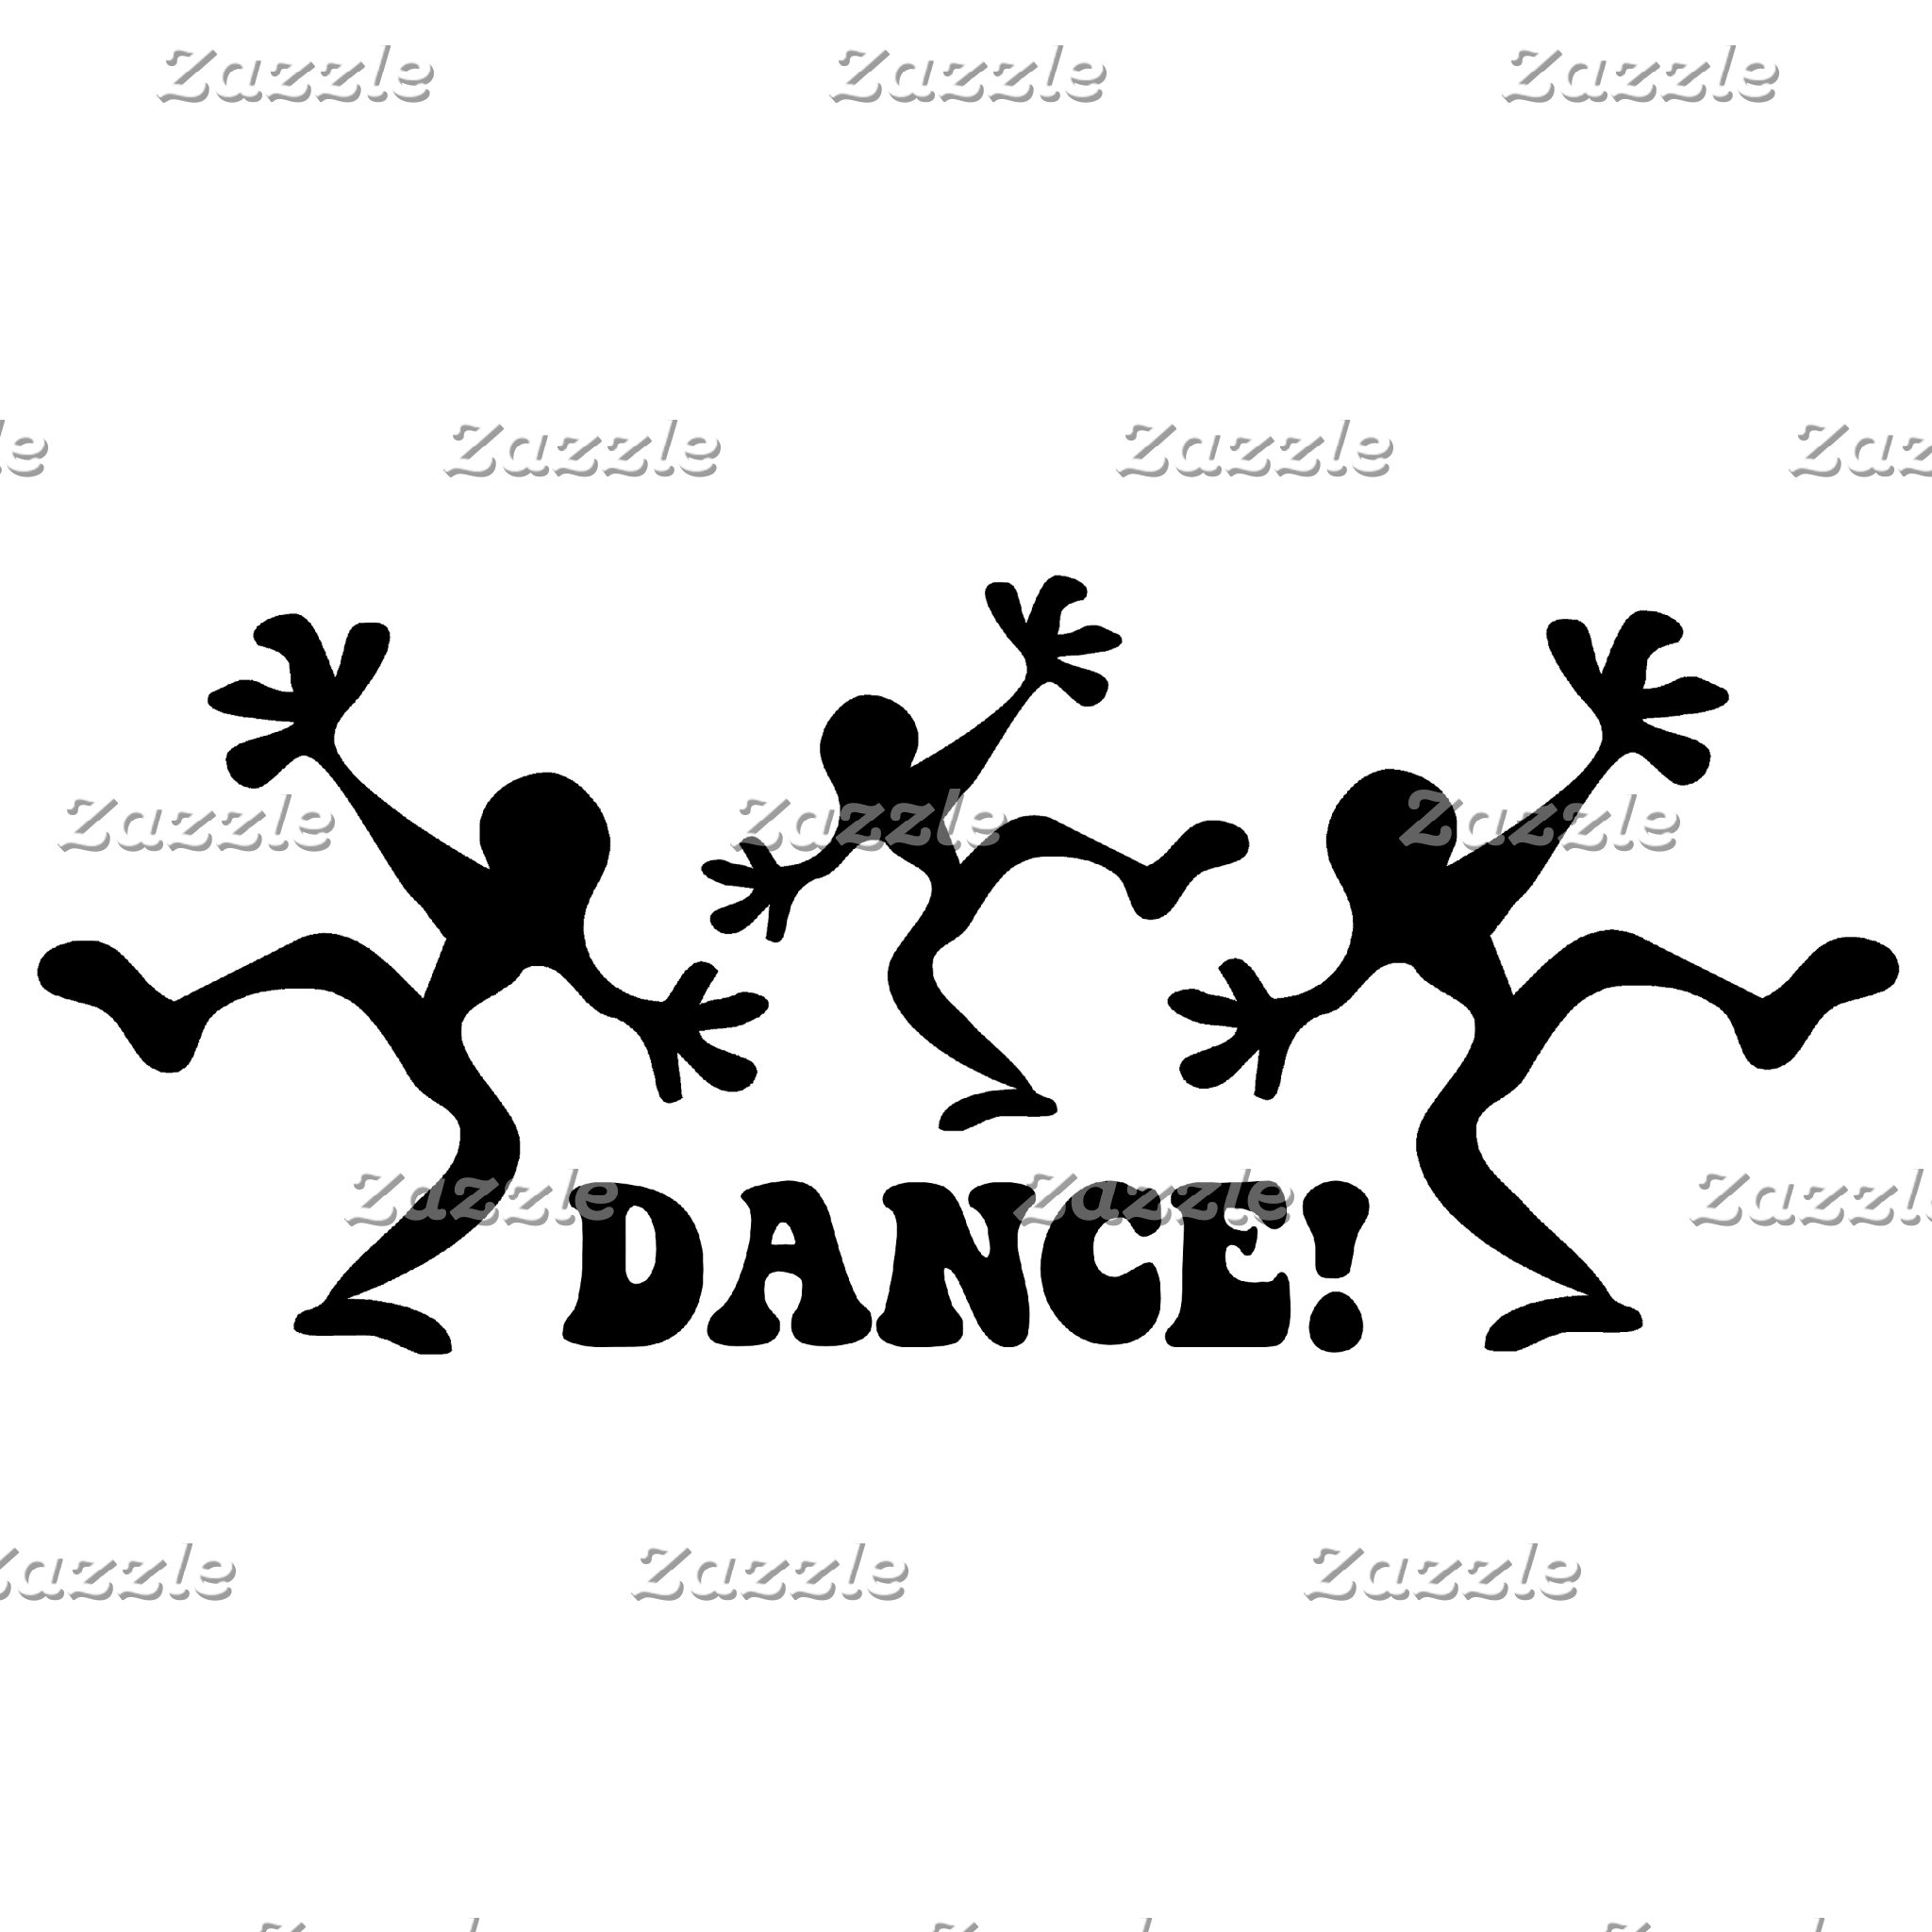 Crazy Dancers 1